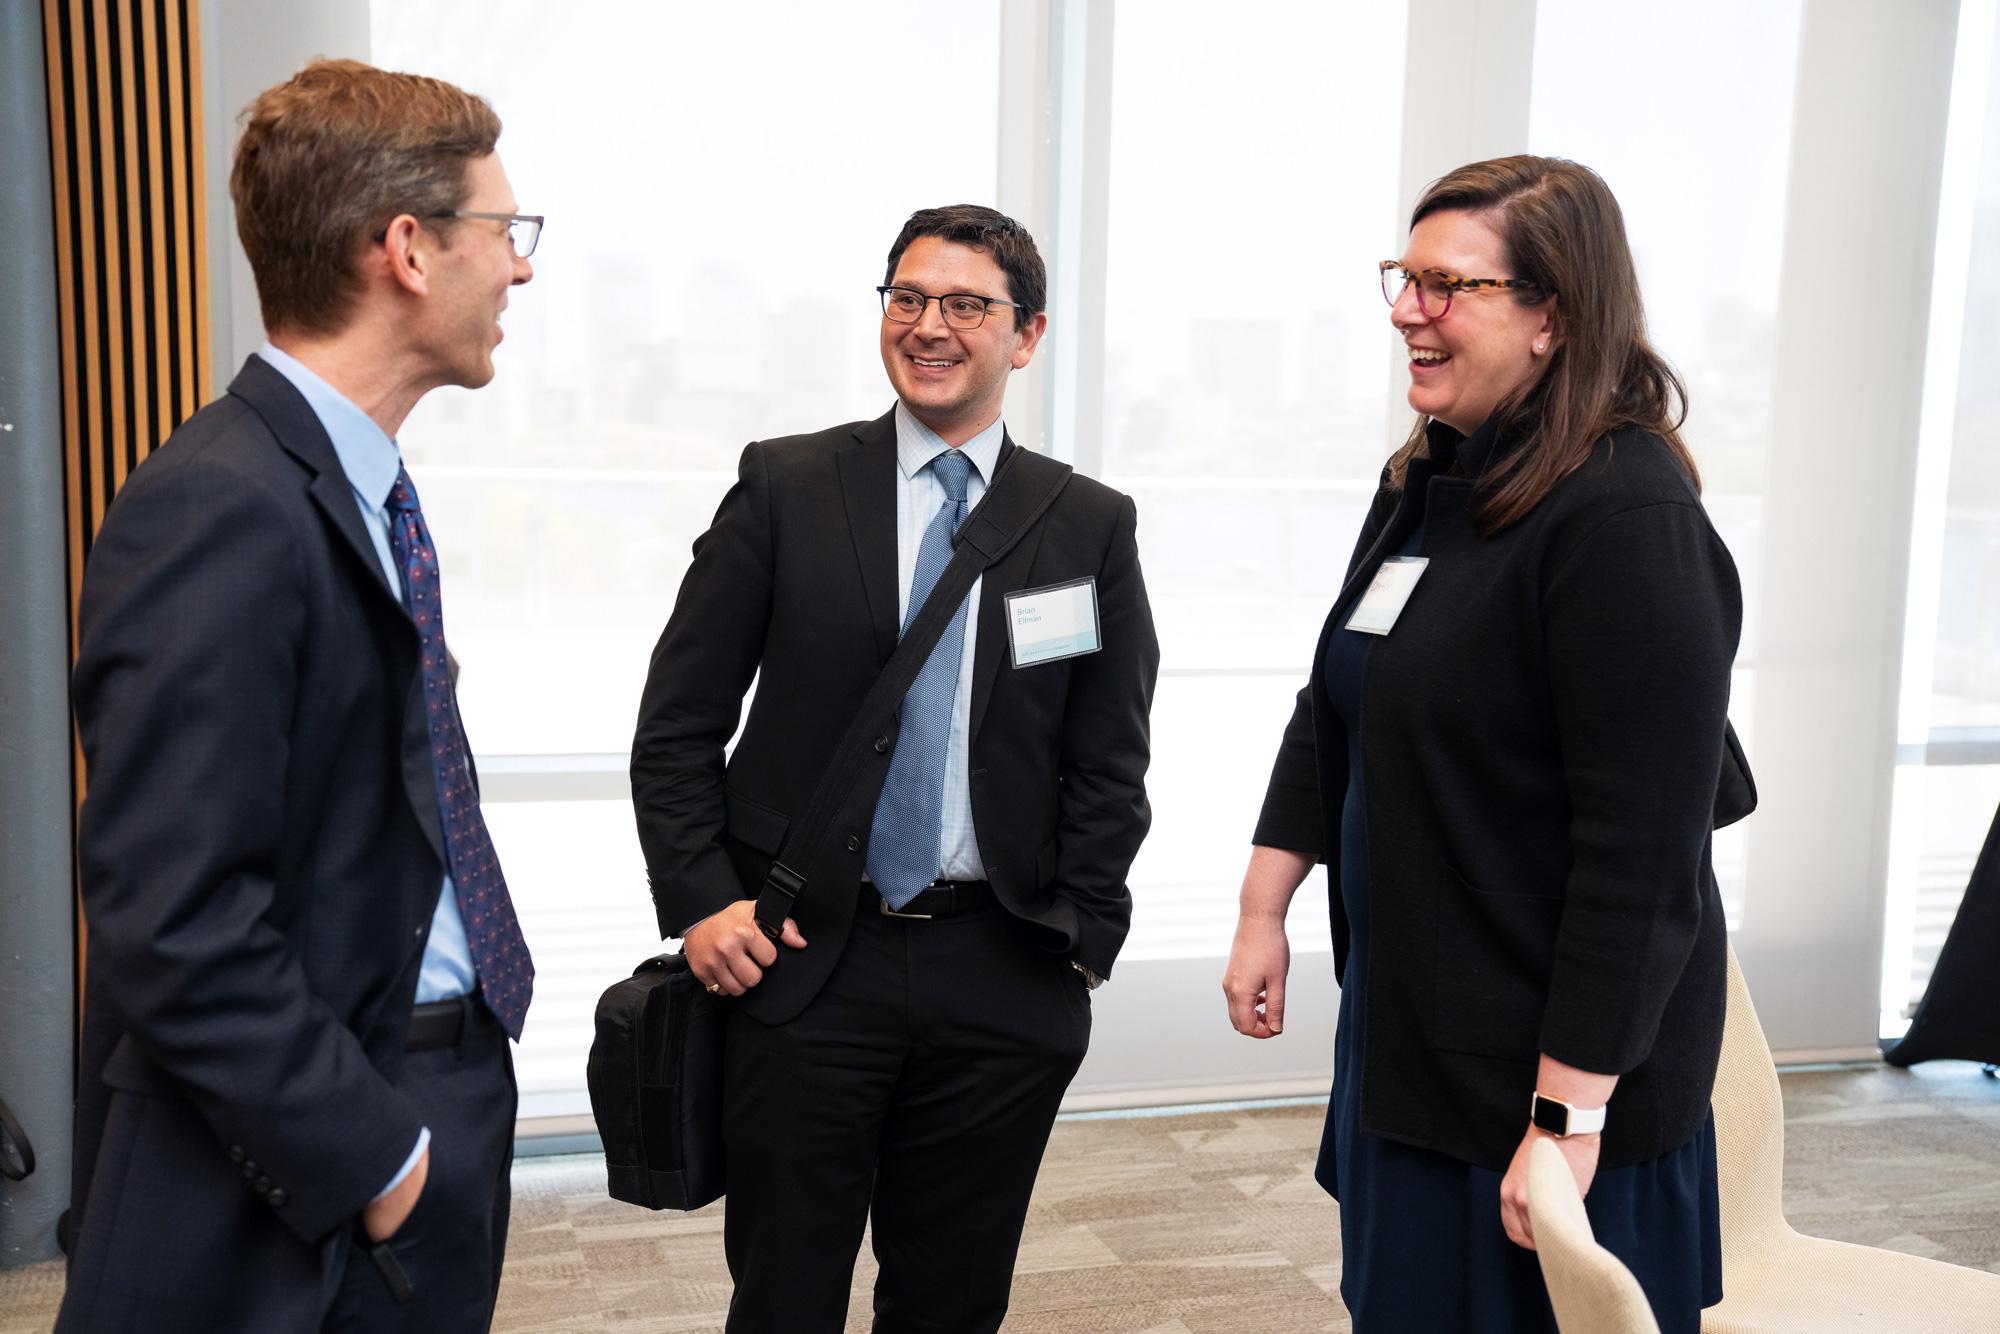 2019 L&ES - Richard Mortimer, Brian Ellman, and Emily Cotton